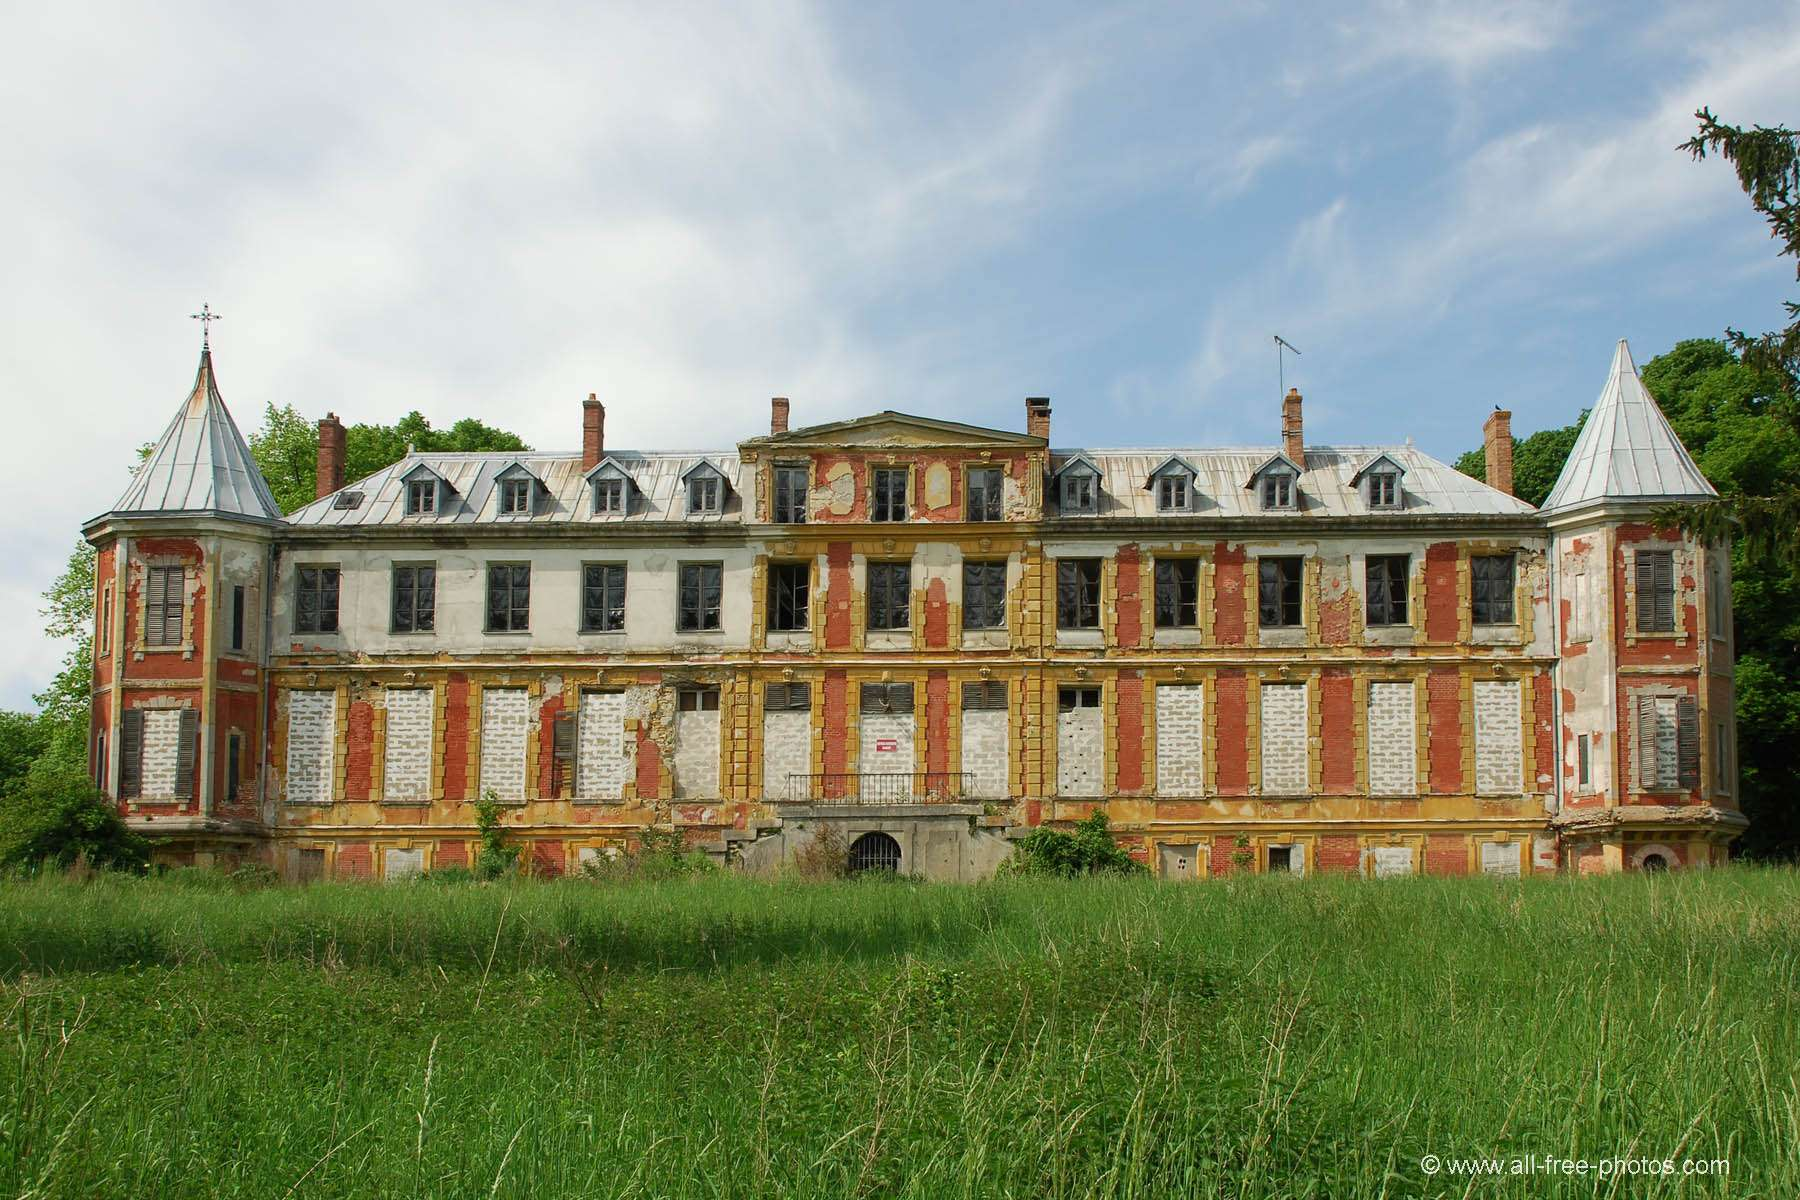 Saint-Germain-lès-Arpajon